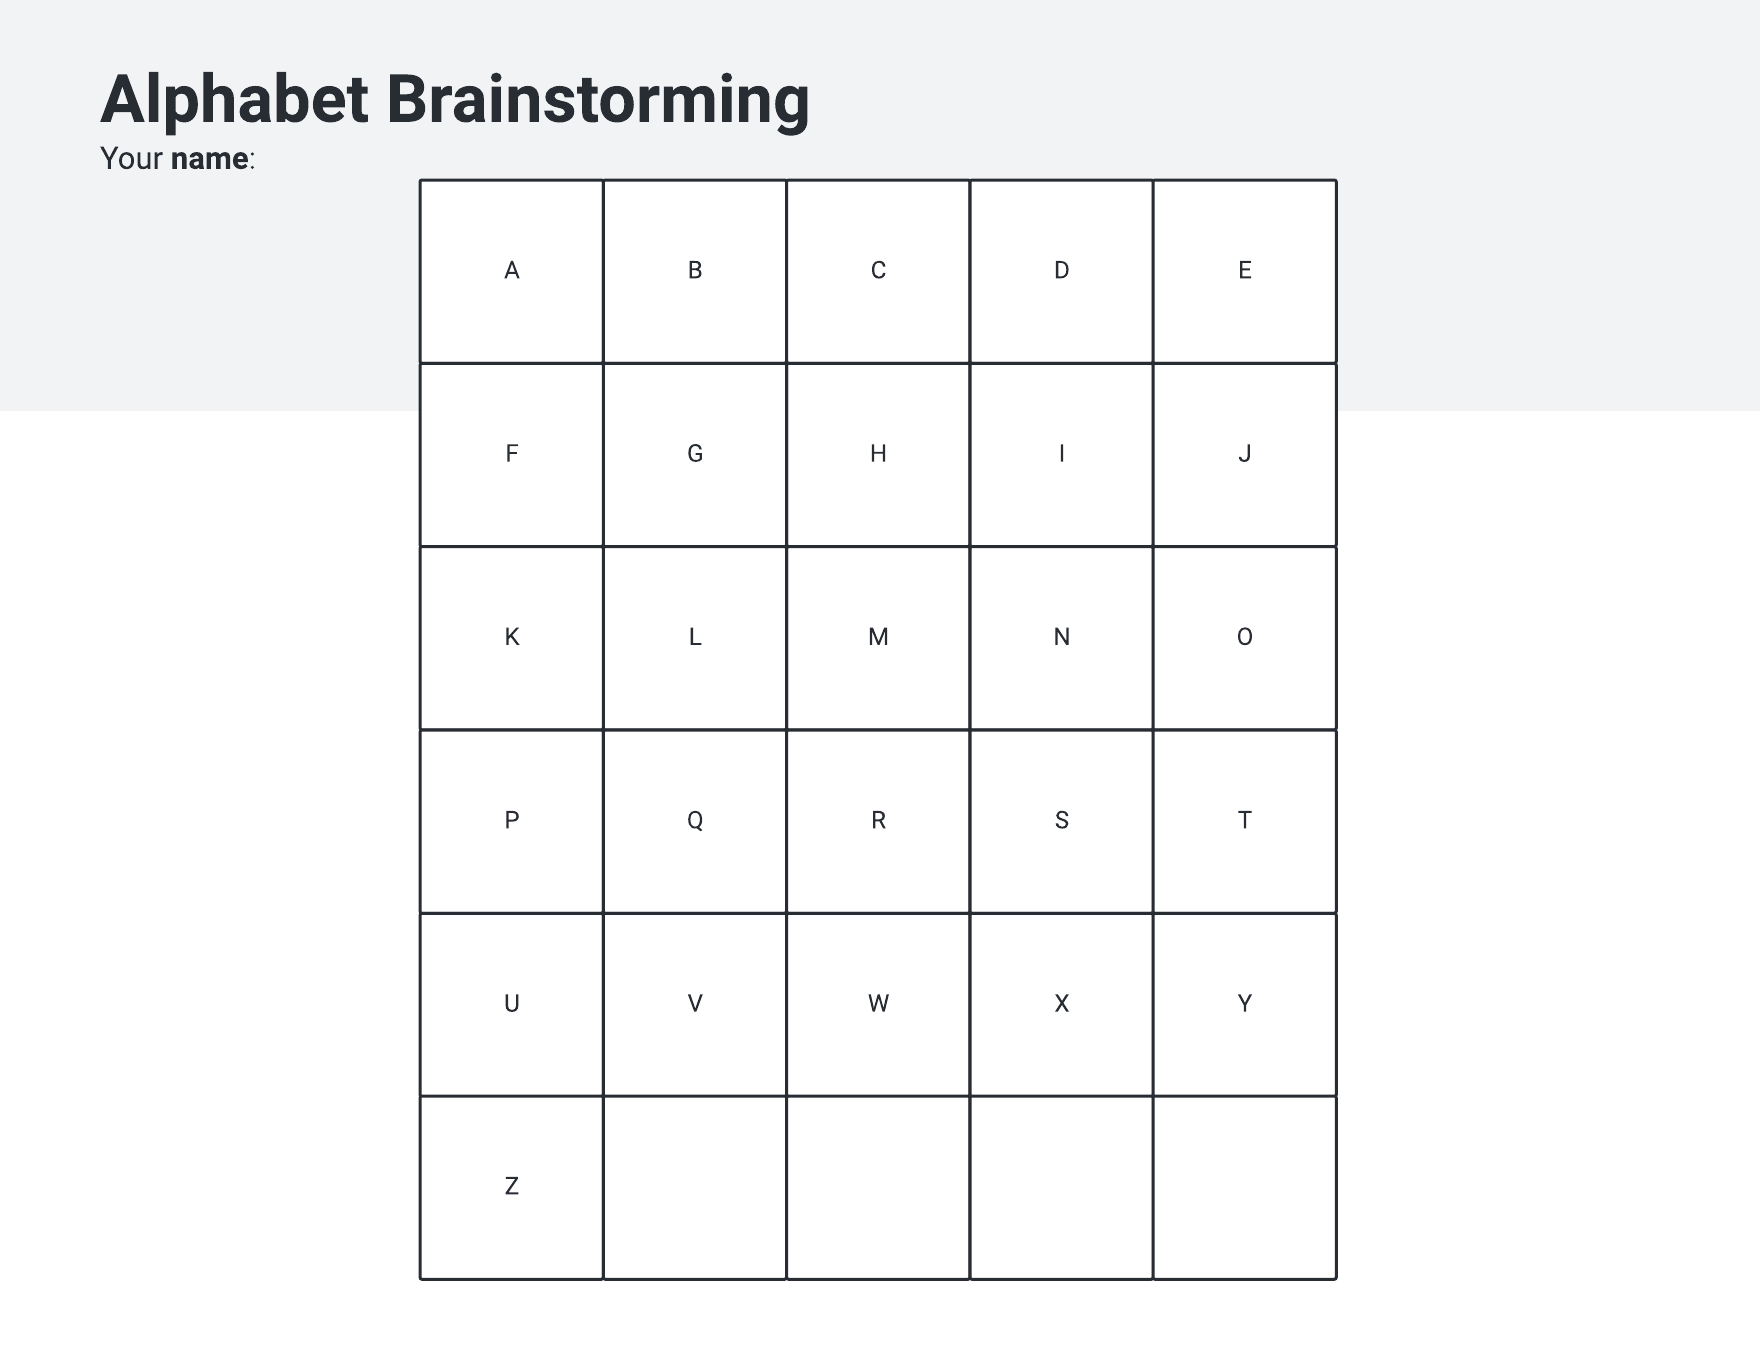 Alphabet brainstorming document